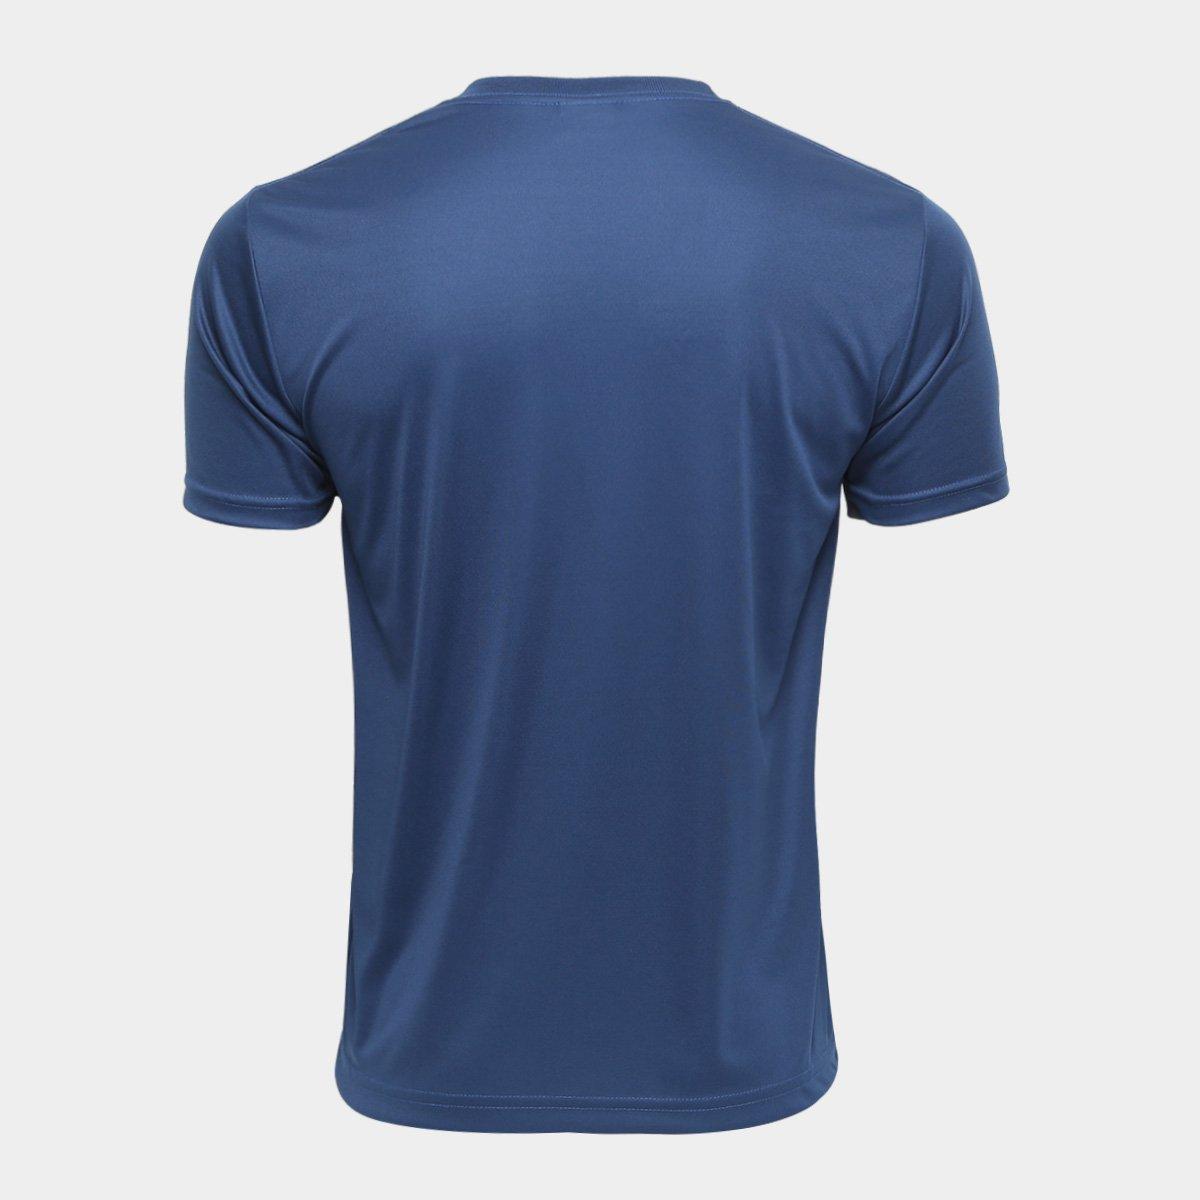 8149899fc6cfe Camiseta Kappa Shangai Masculina - Marinho - Compre Agora